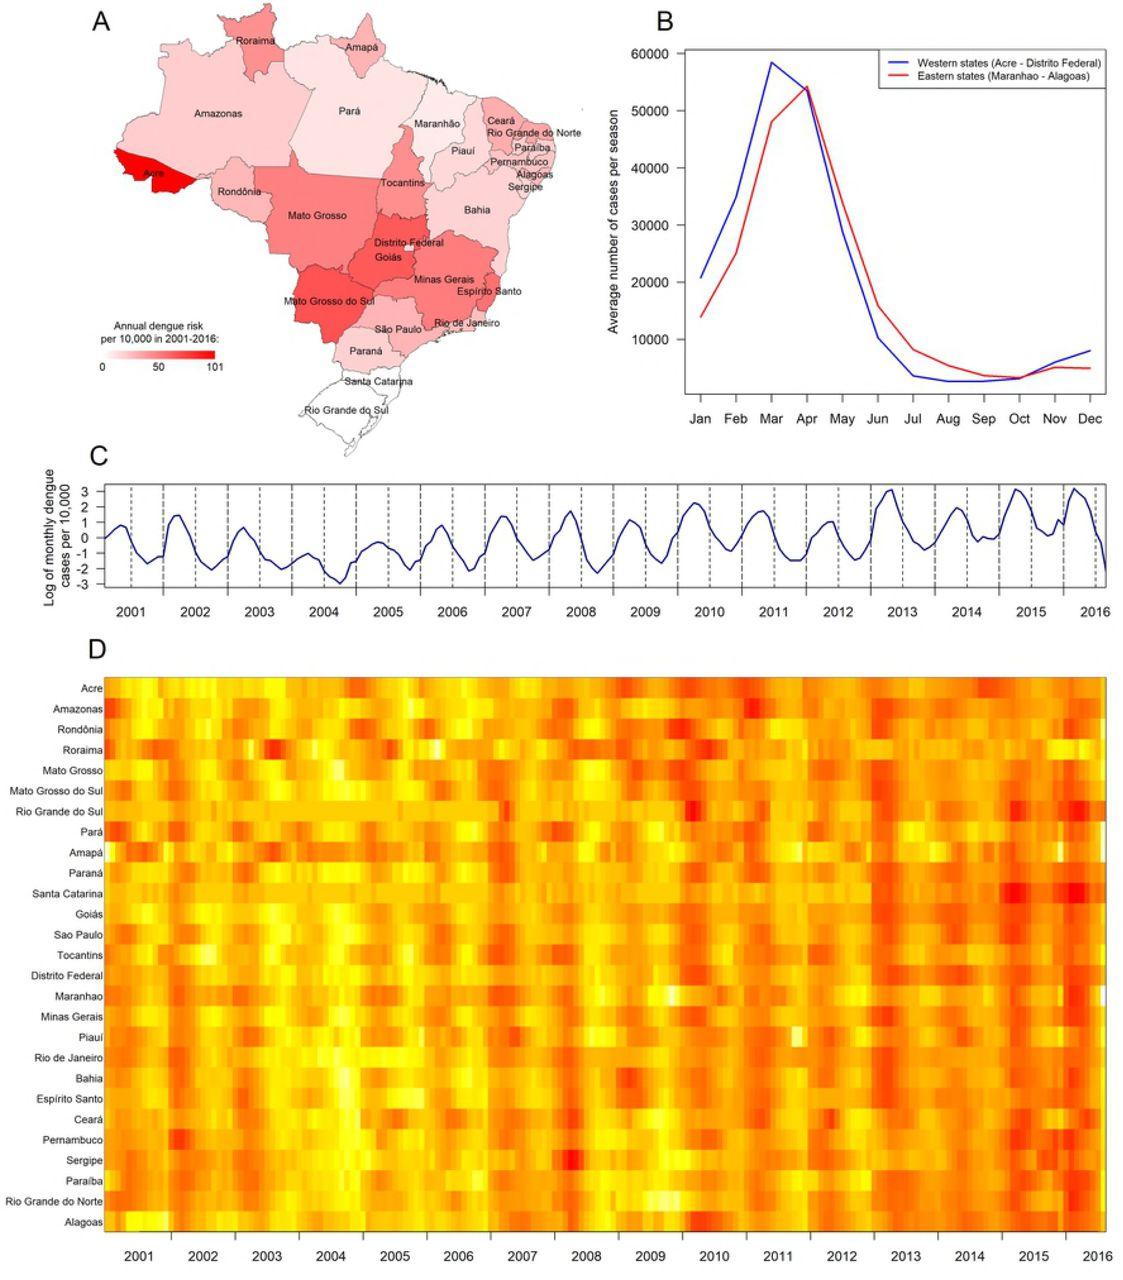 Spatio-temporal dynamics of dengue in Brazil: seasonal travelling